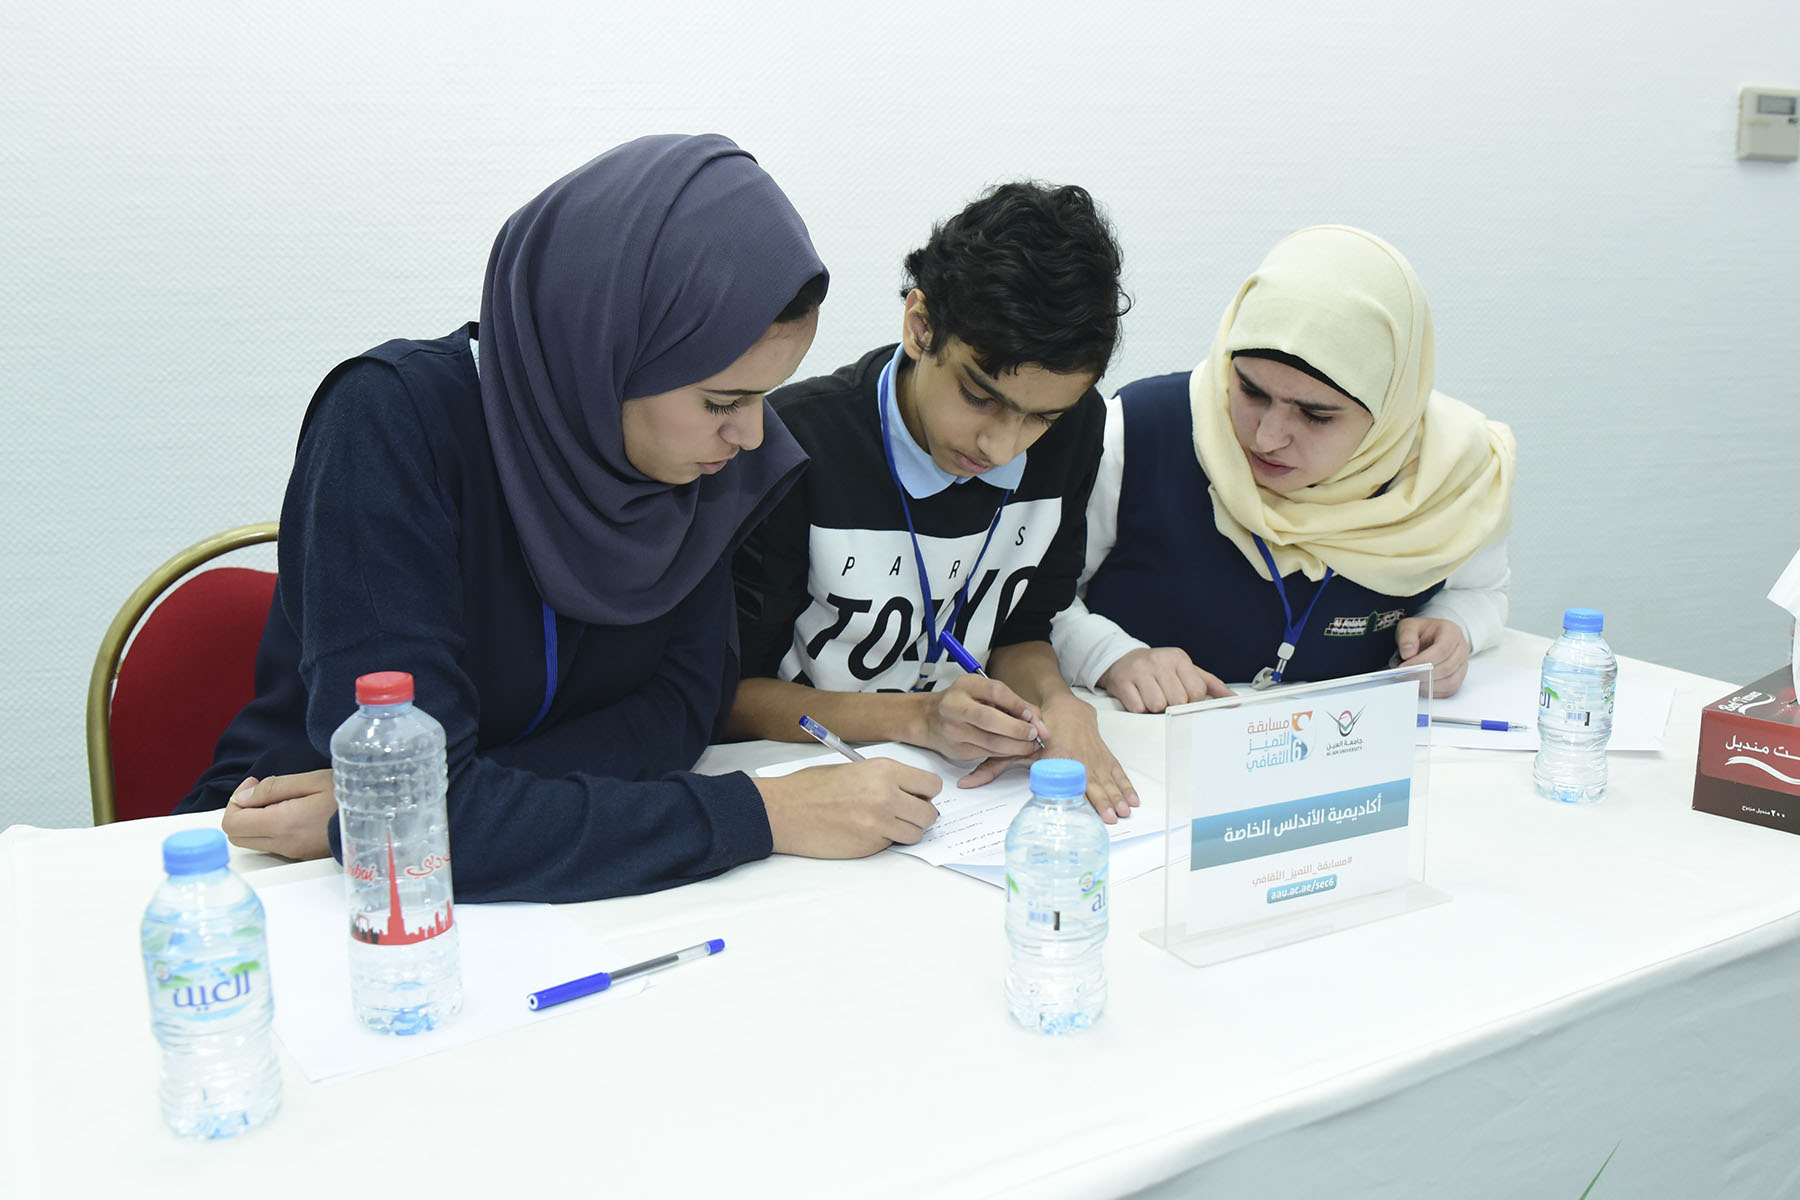 Fifth Day (Emirates Falcon International Private School VS Al Andalus Private Academy)